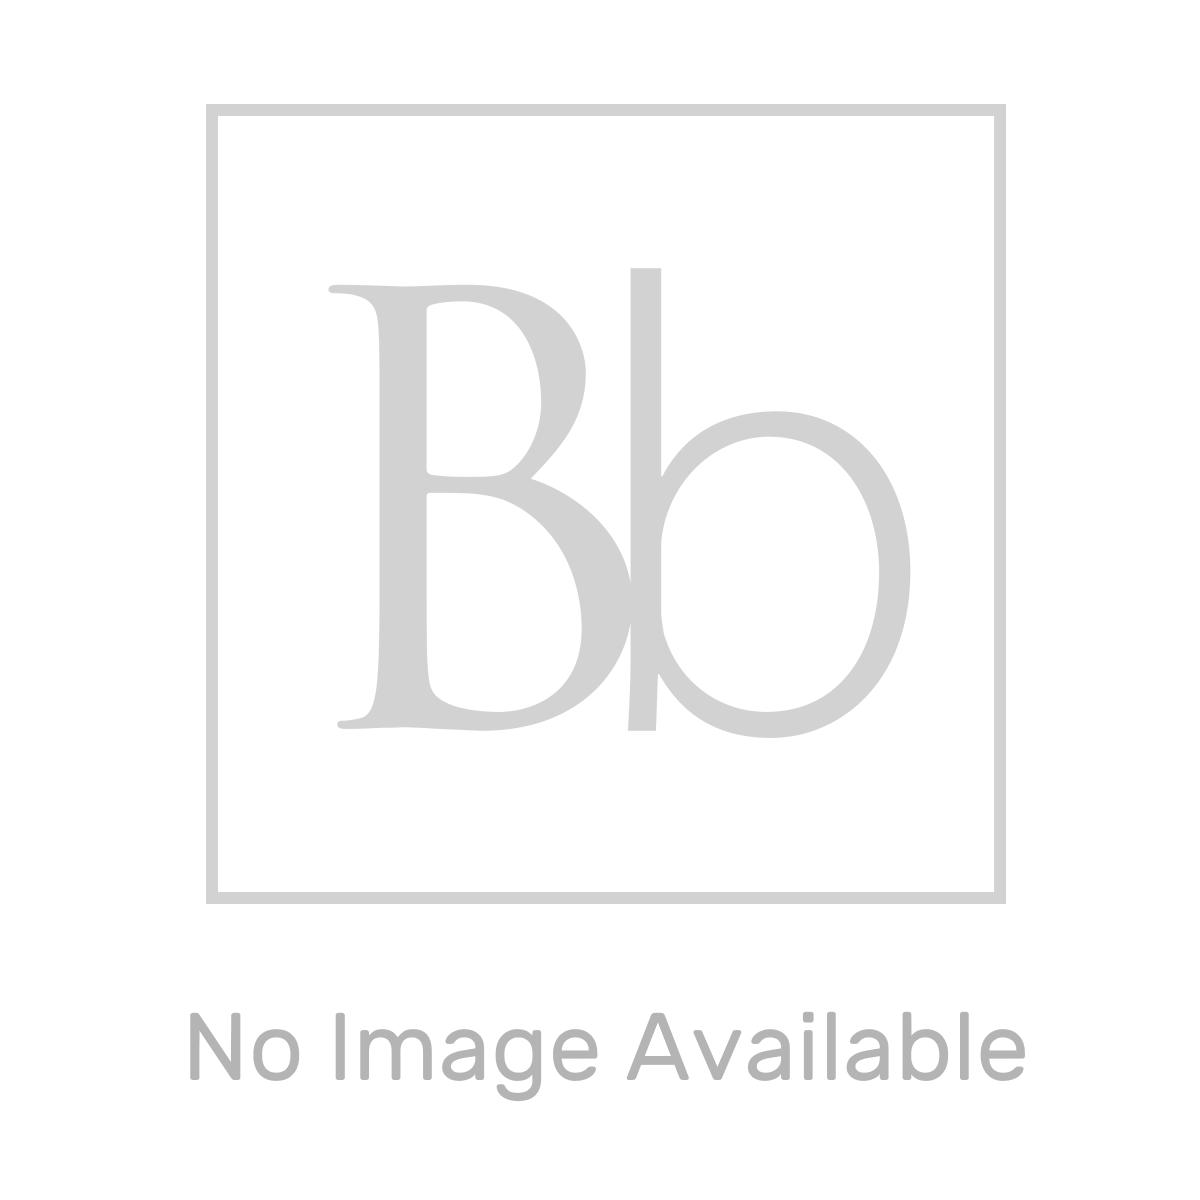 Tavistock Alpine Soft Close Thermoset Toilet Seat in White